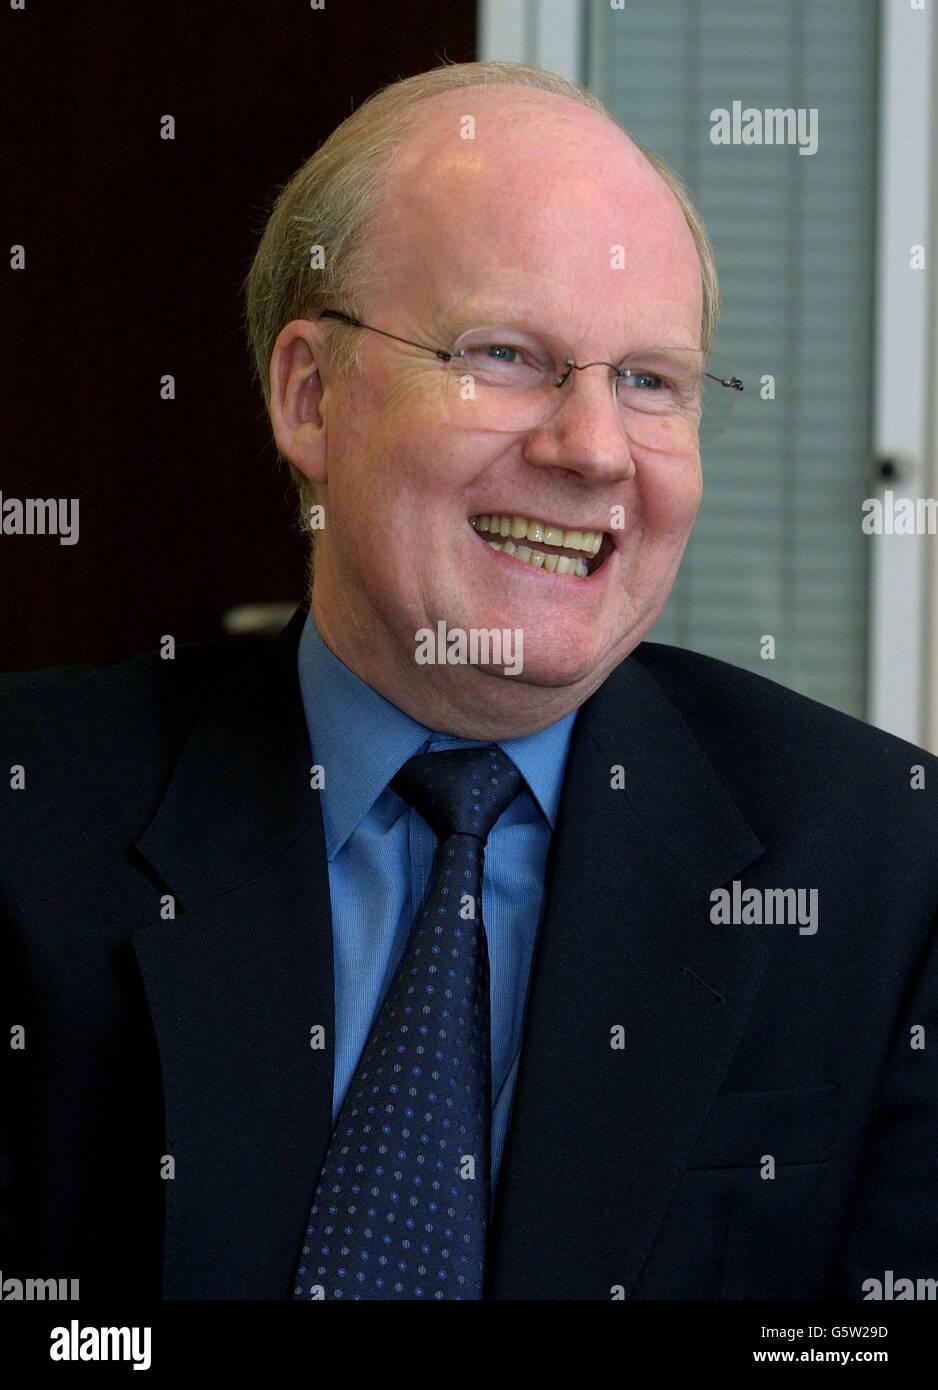 Murdoch Maclennan 2 - Stock Image